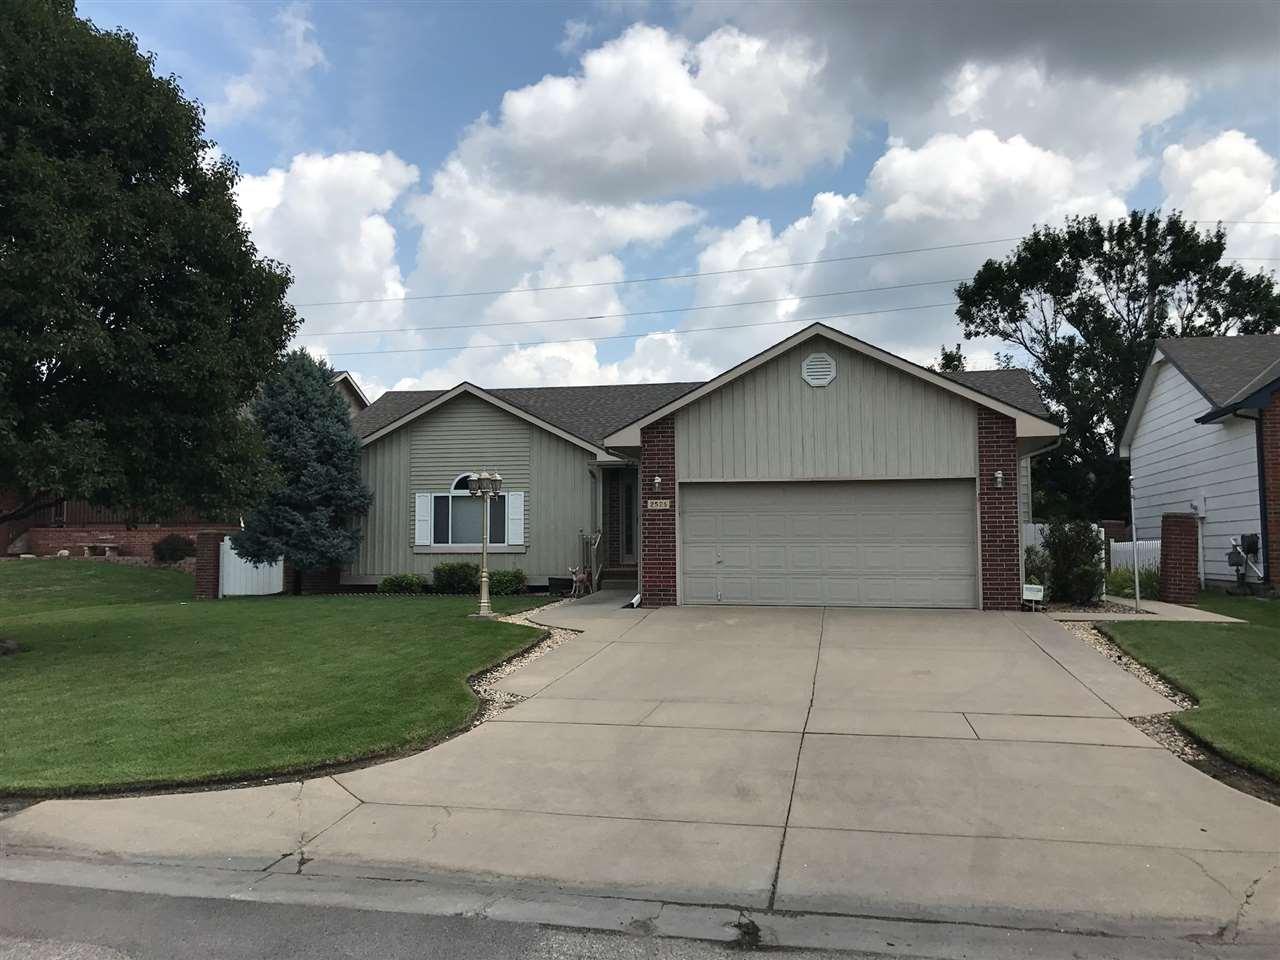 2526 N Baytree St, Wichita, KS 67205